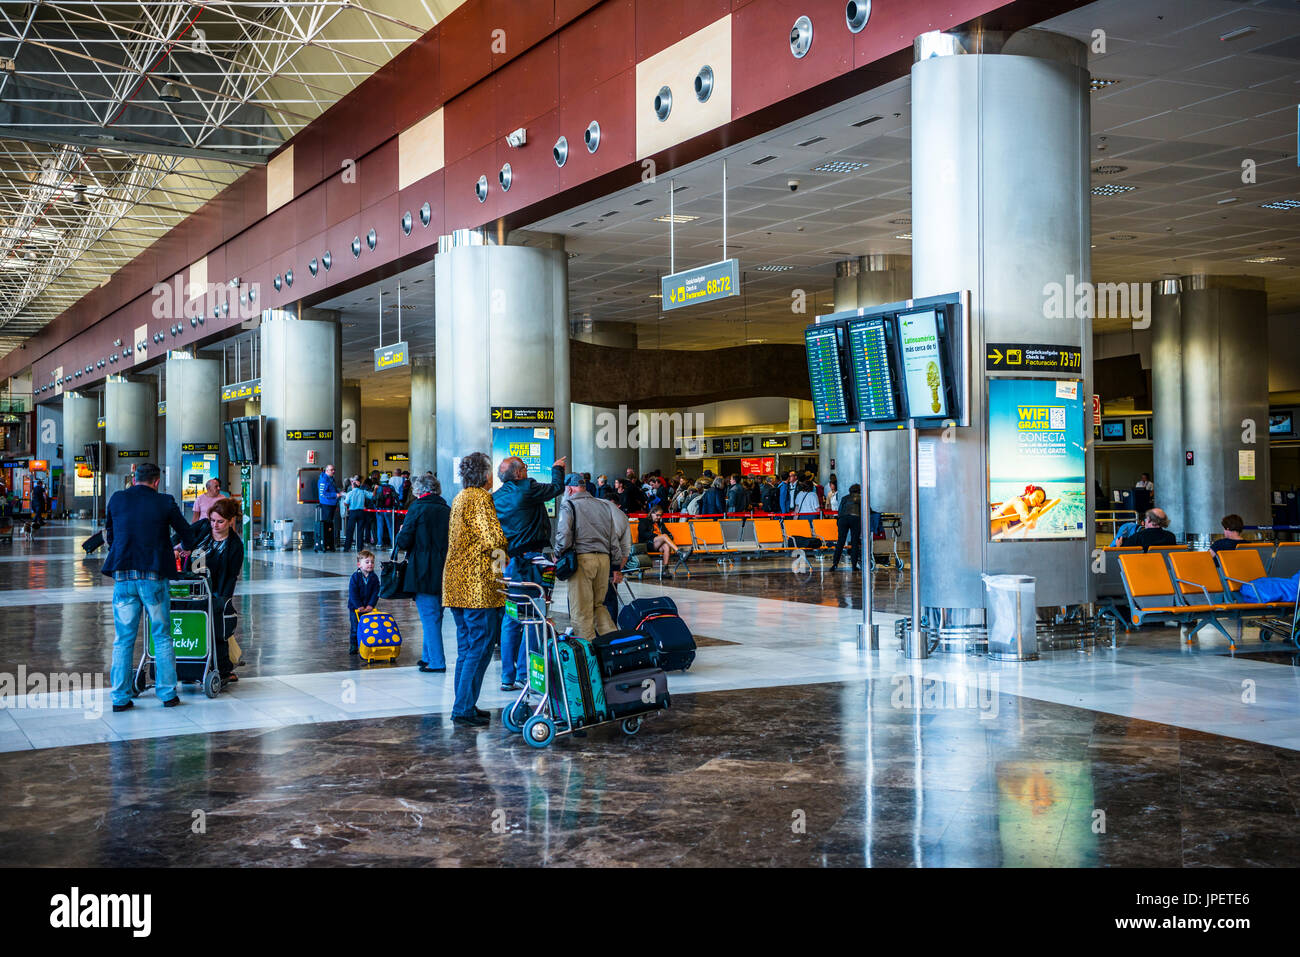 Aeroporto Tenerife Sud : Sala partenze aeroporto di tenerife sud reina sofia tenerife isole